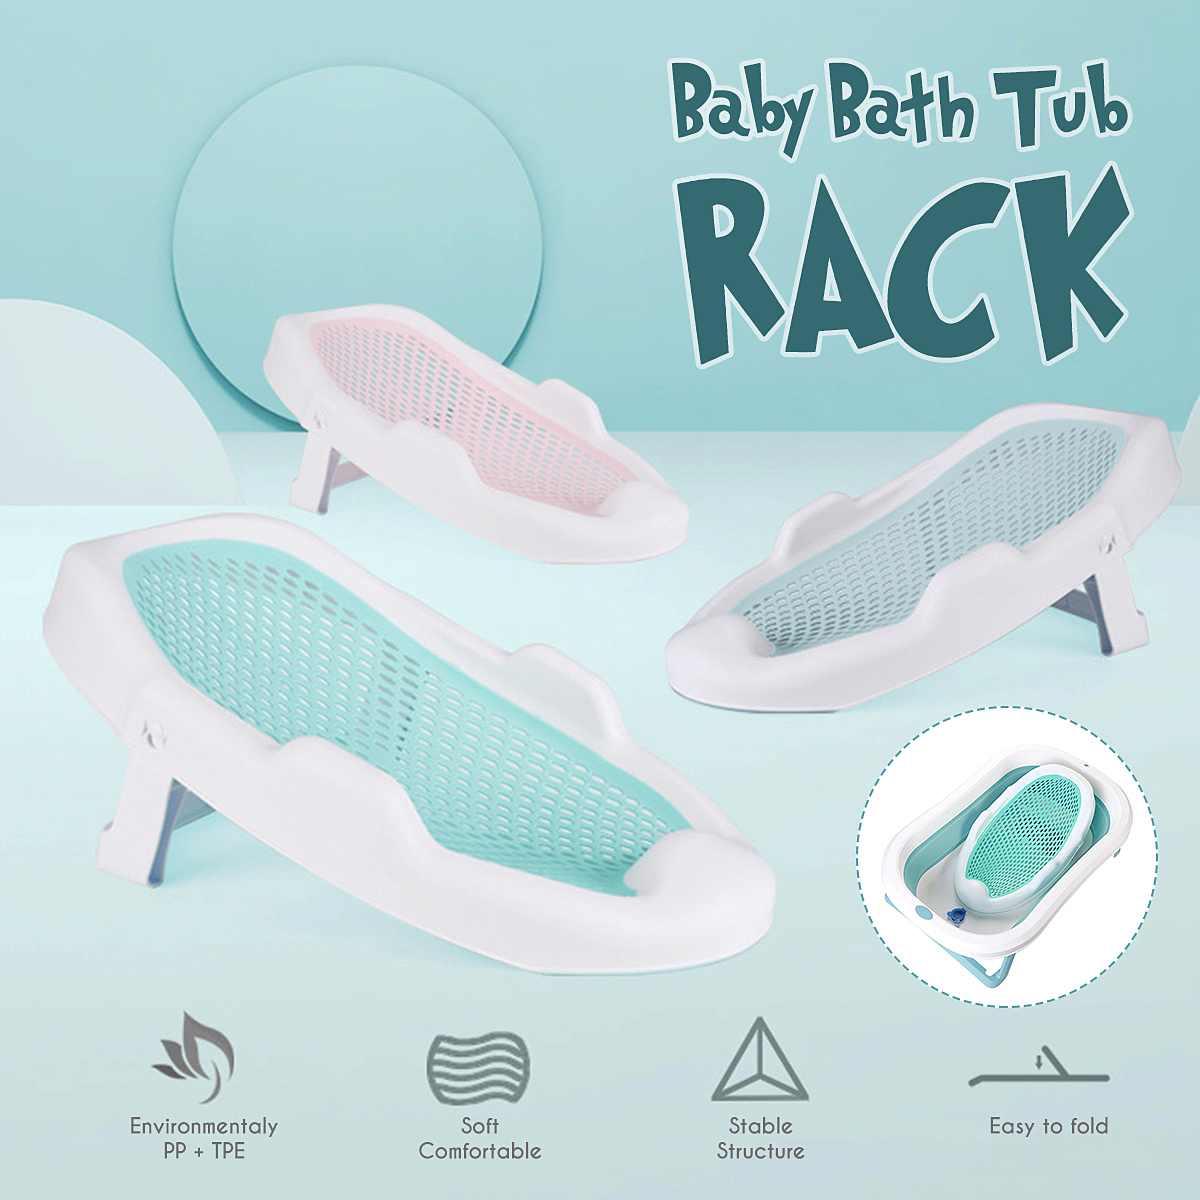 Baby Bath Rack Newborn Non-slip Bath Tub Protection Soft Kids Bathtub Bath Shower Rack Hollow Out Seat Support For Infant Baby